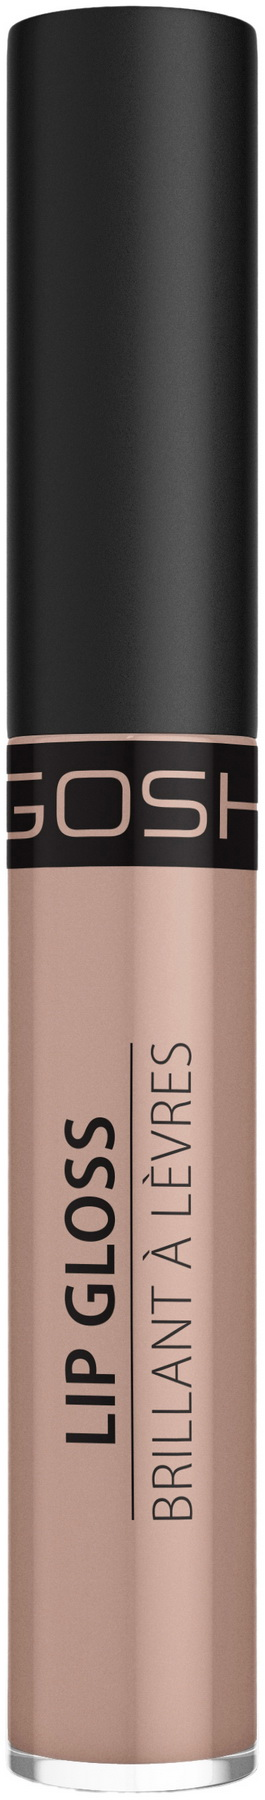 Блеск для губ Gosh Lip Gloss 003